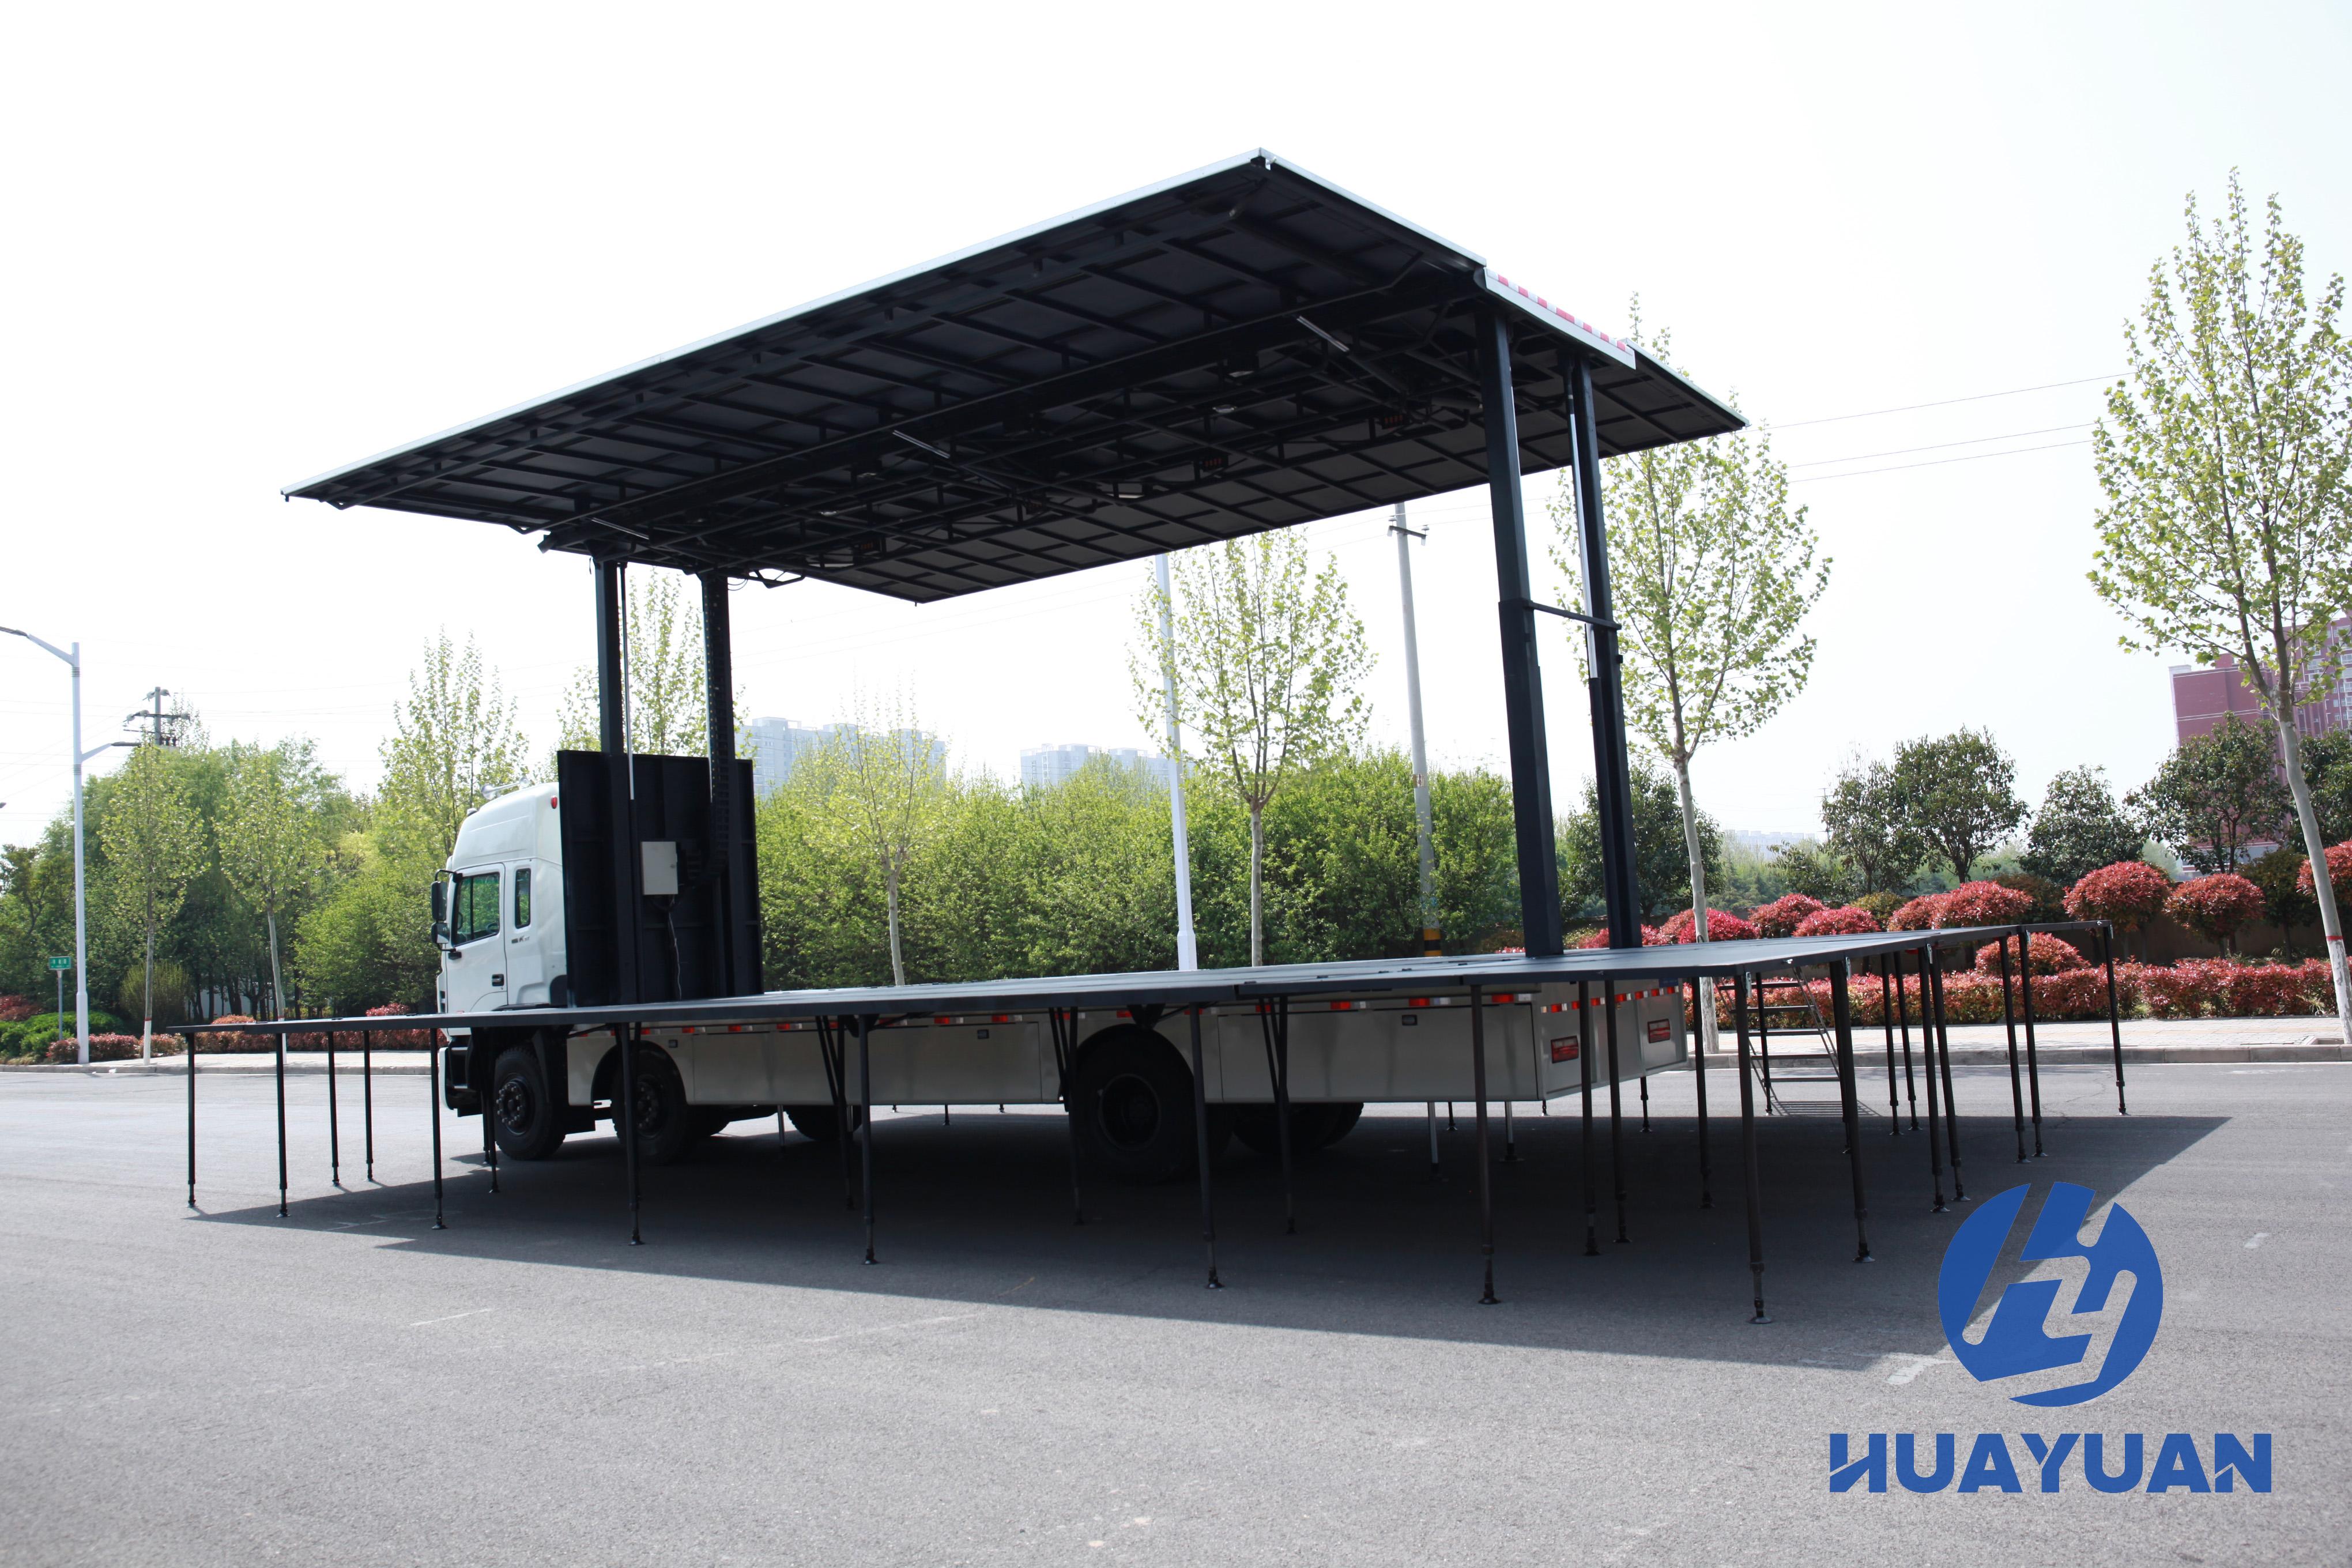 HY-stage-truck 1 (10).JPG